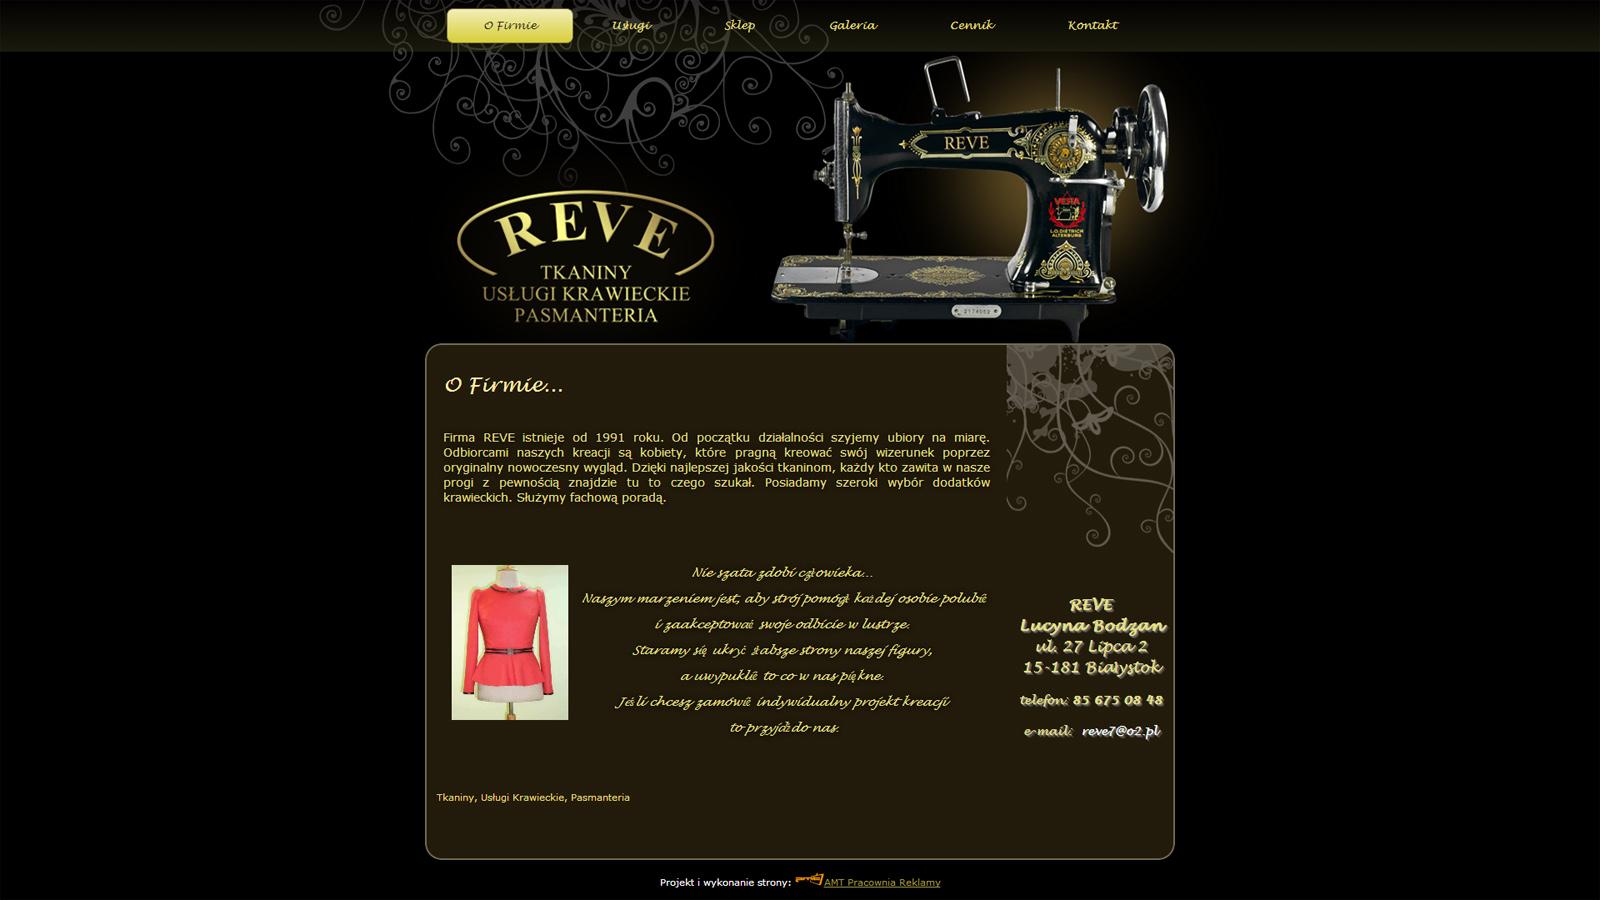 Reve.pl